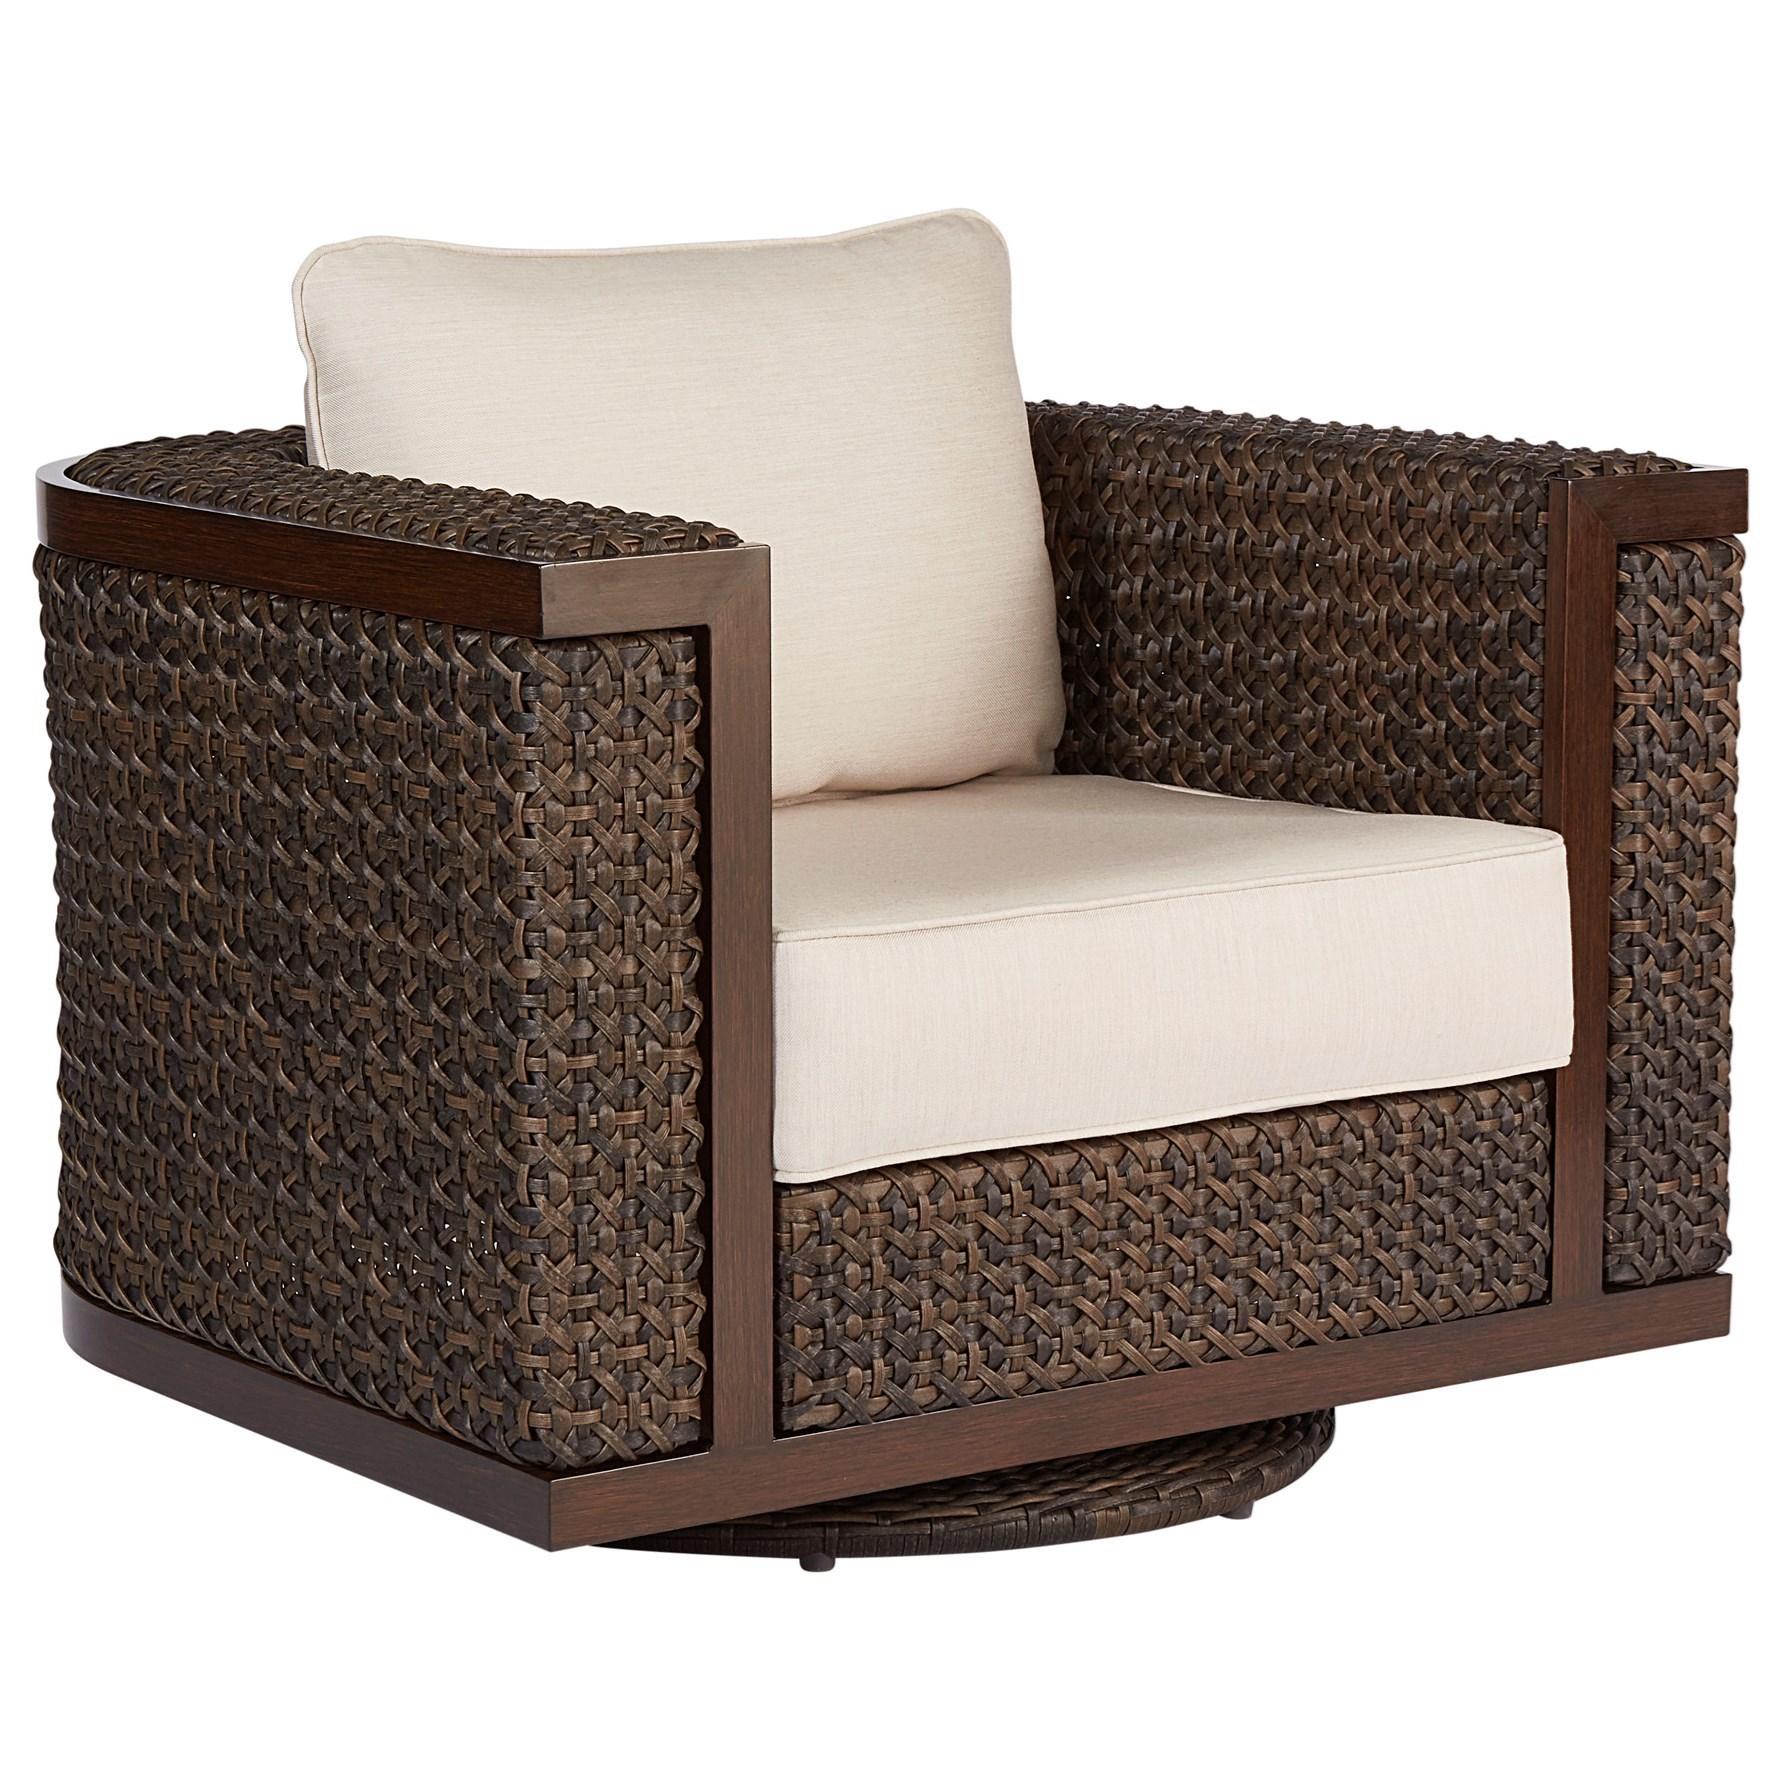 Attirant A.R.T. Furniture Inc Epicenters OutdoorBrentwood Wicker Swivel Rocking Club  Chair ...